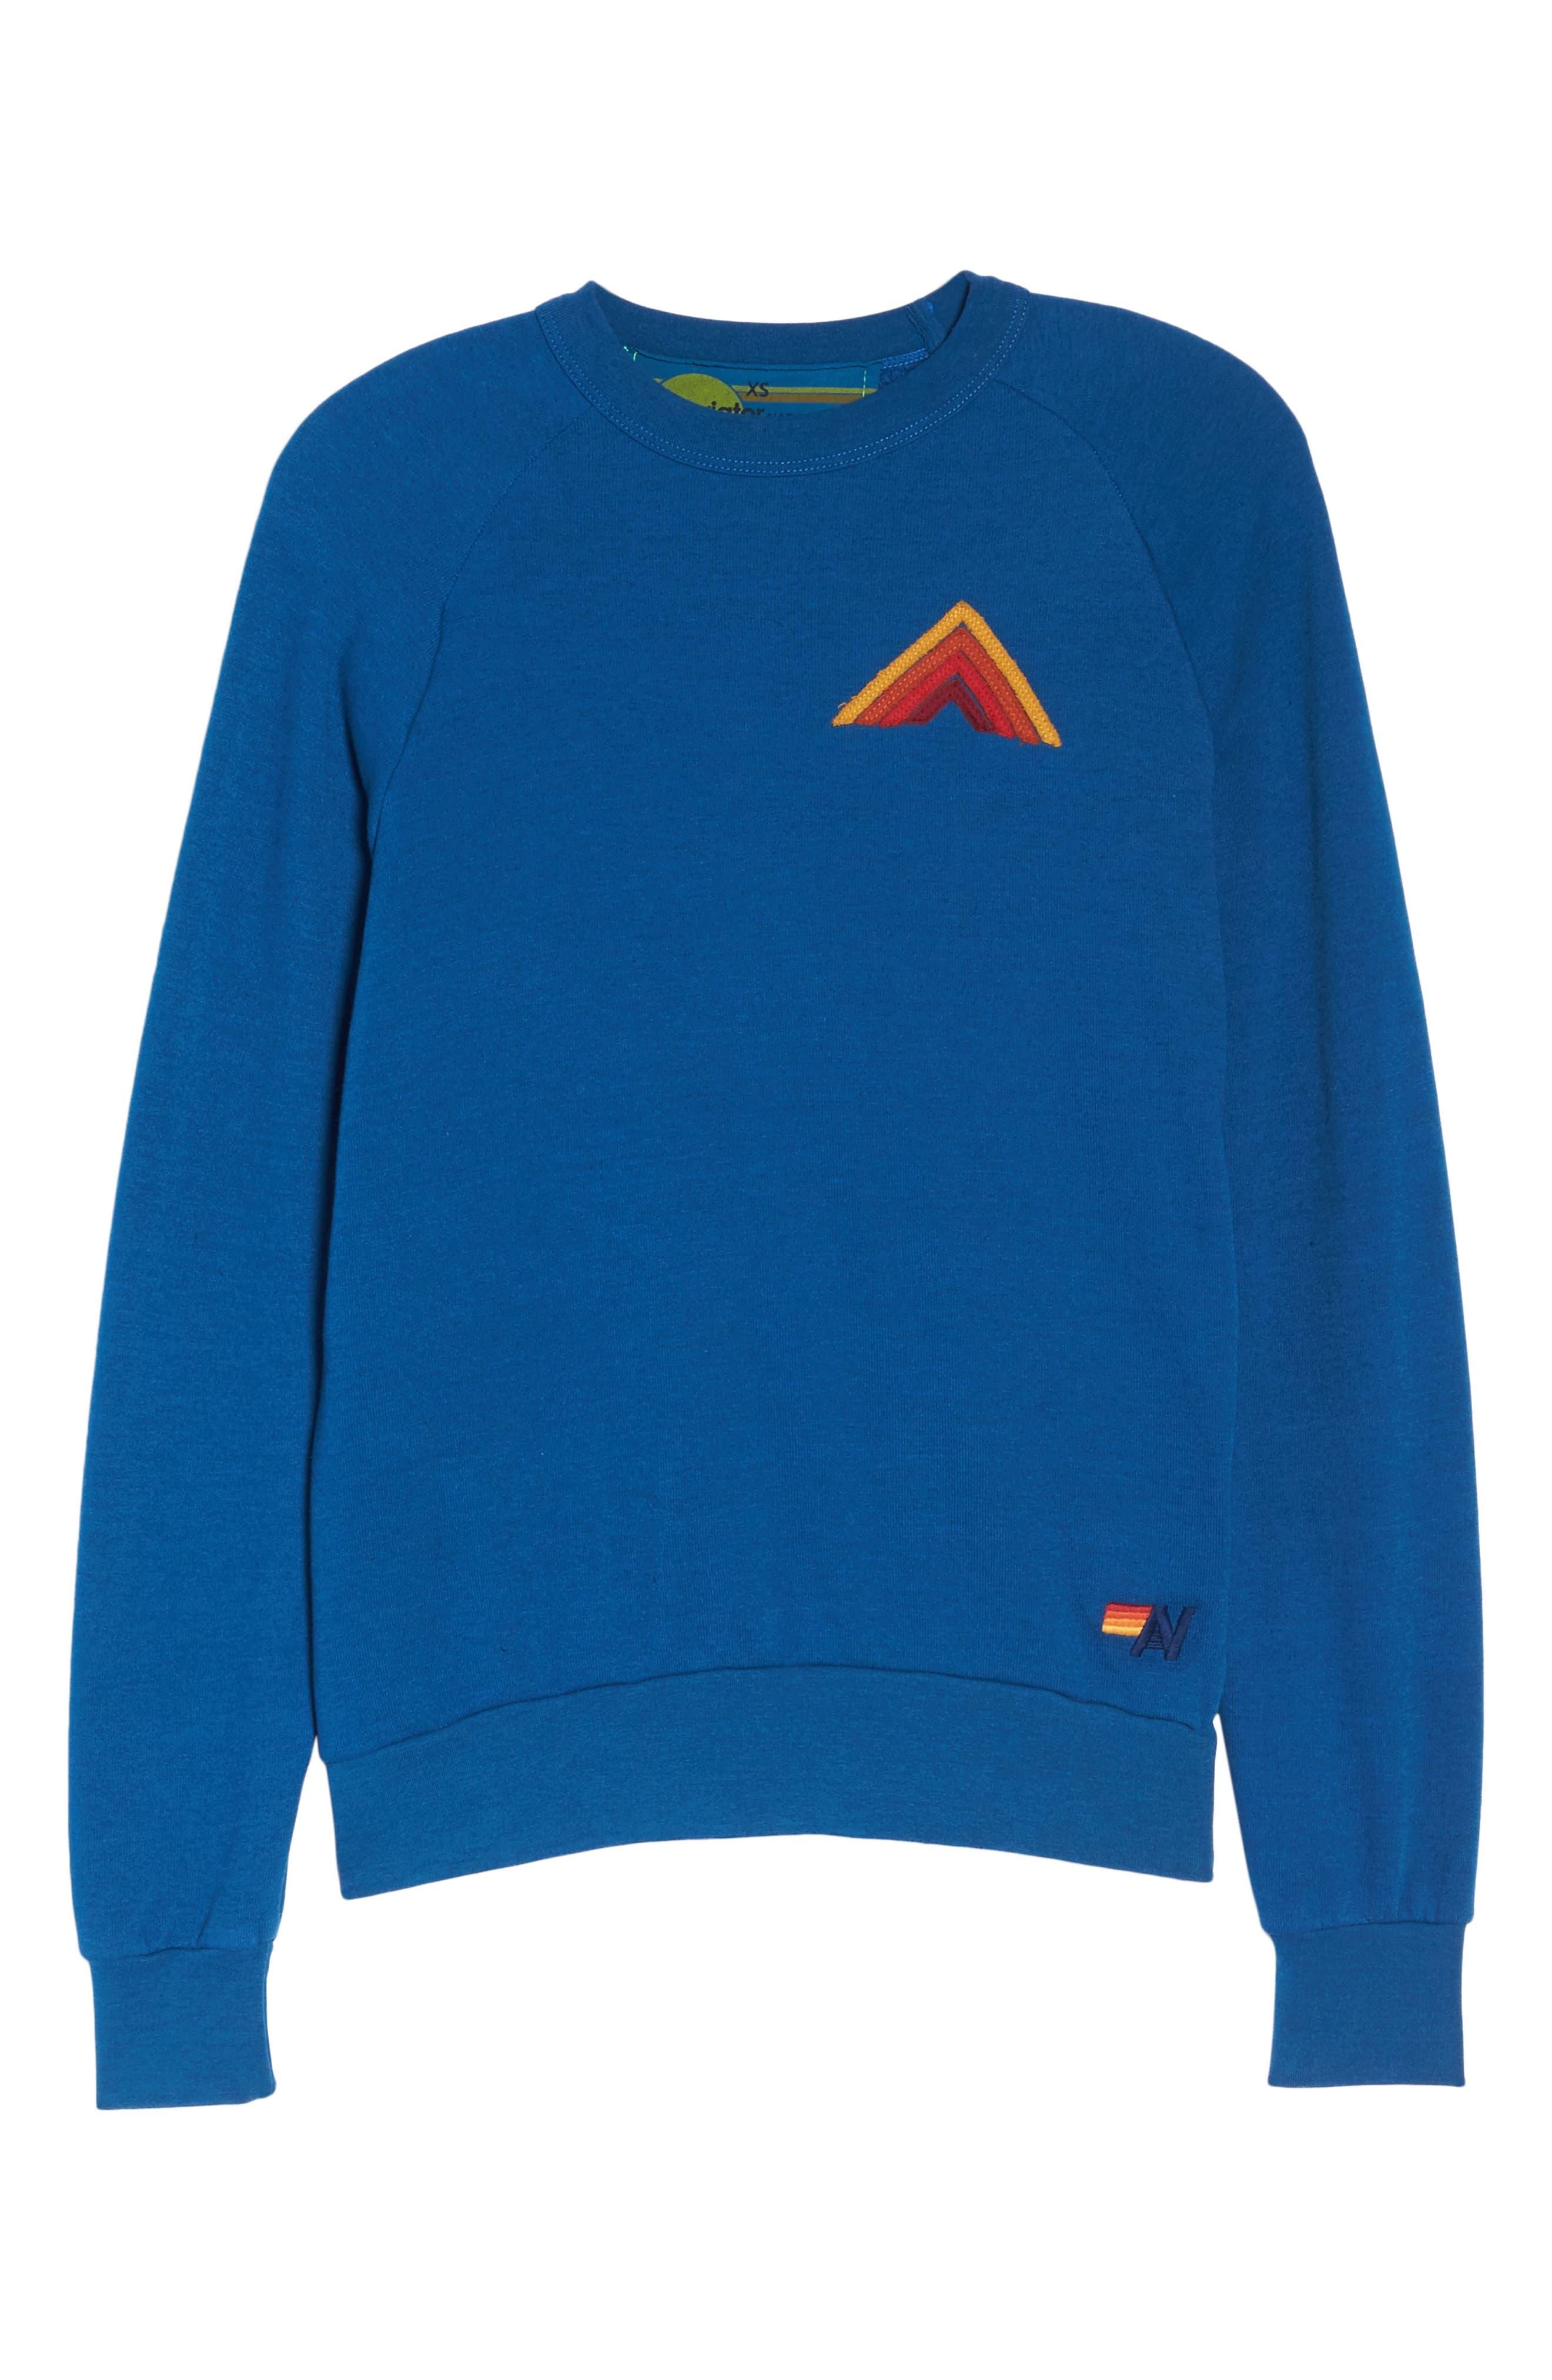 Mountain Stripe Crewneck Sweatshirt,                             Alternate thumbnail 8, color,                             Caribbean/ Red Stripes